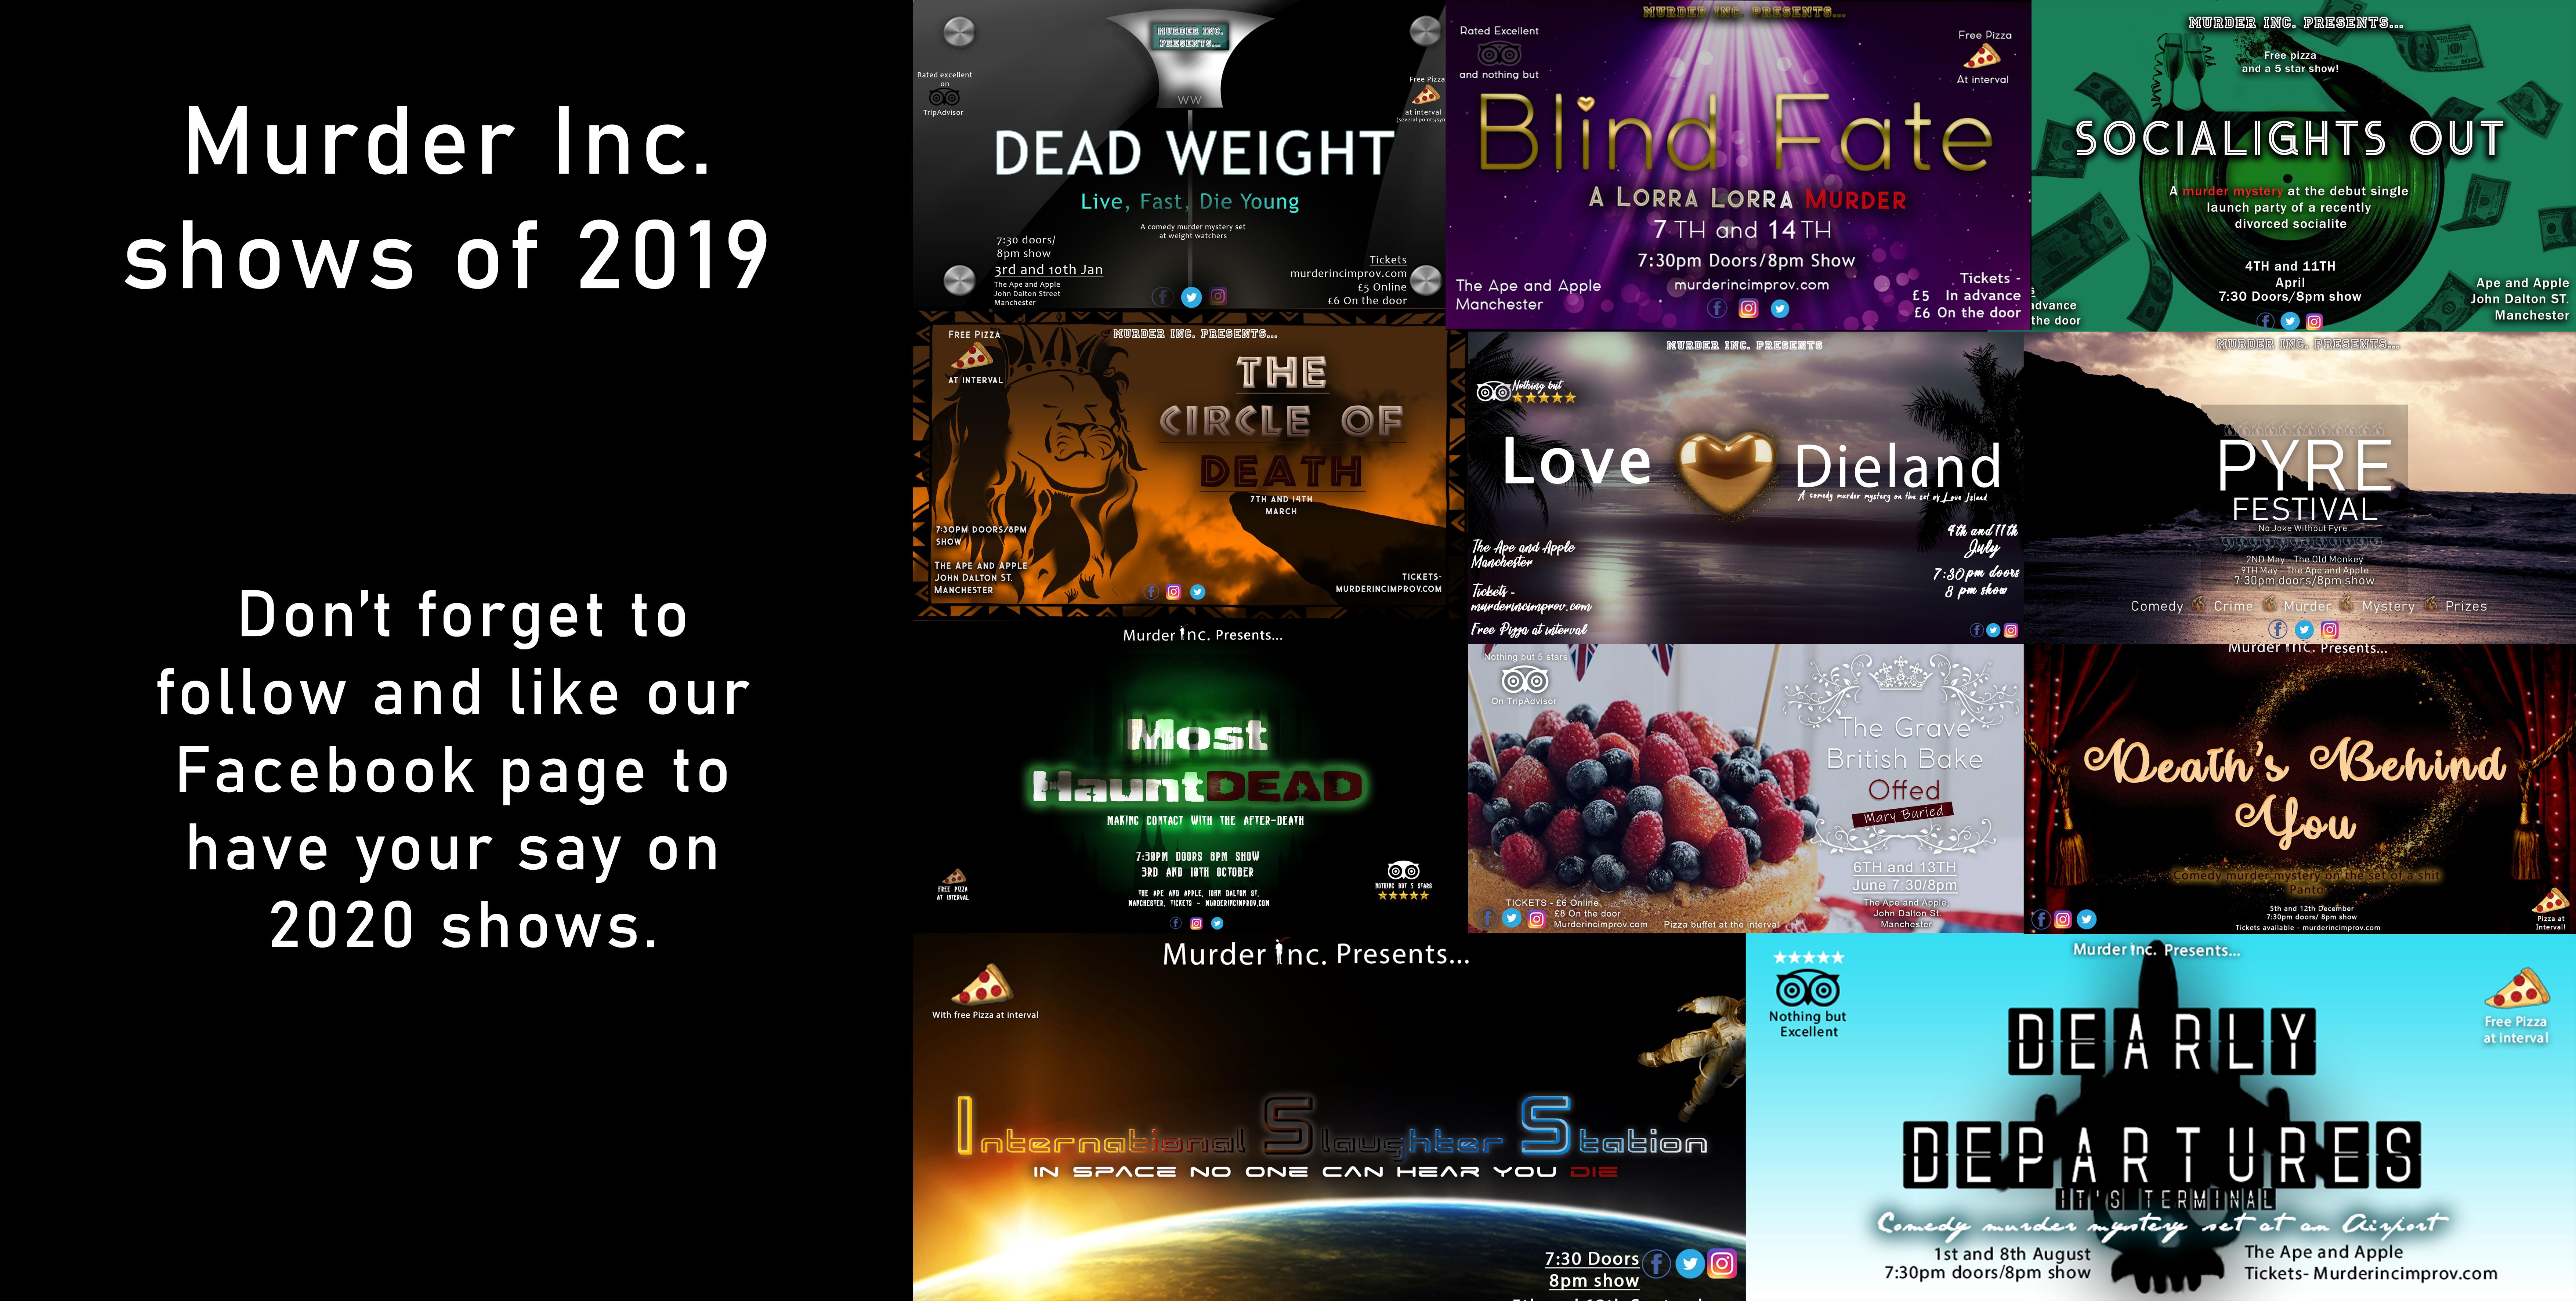 website promo gallery